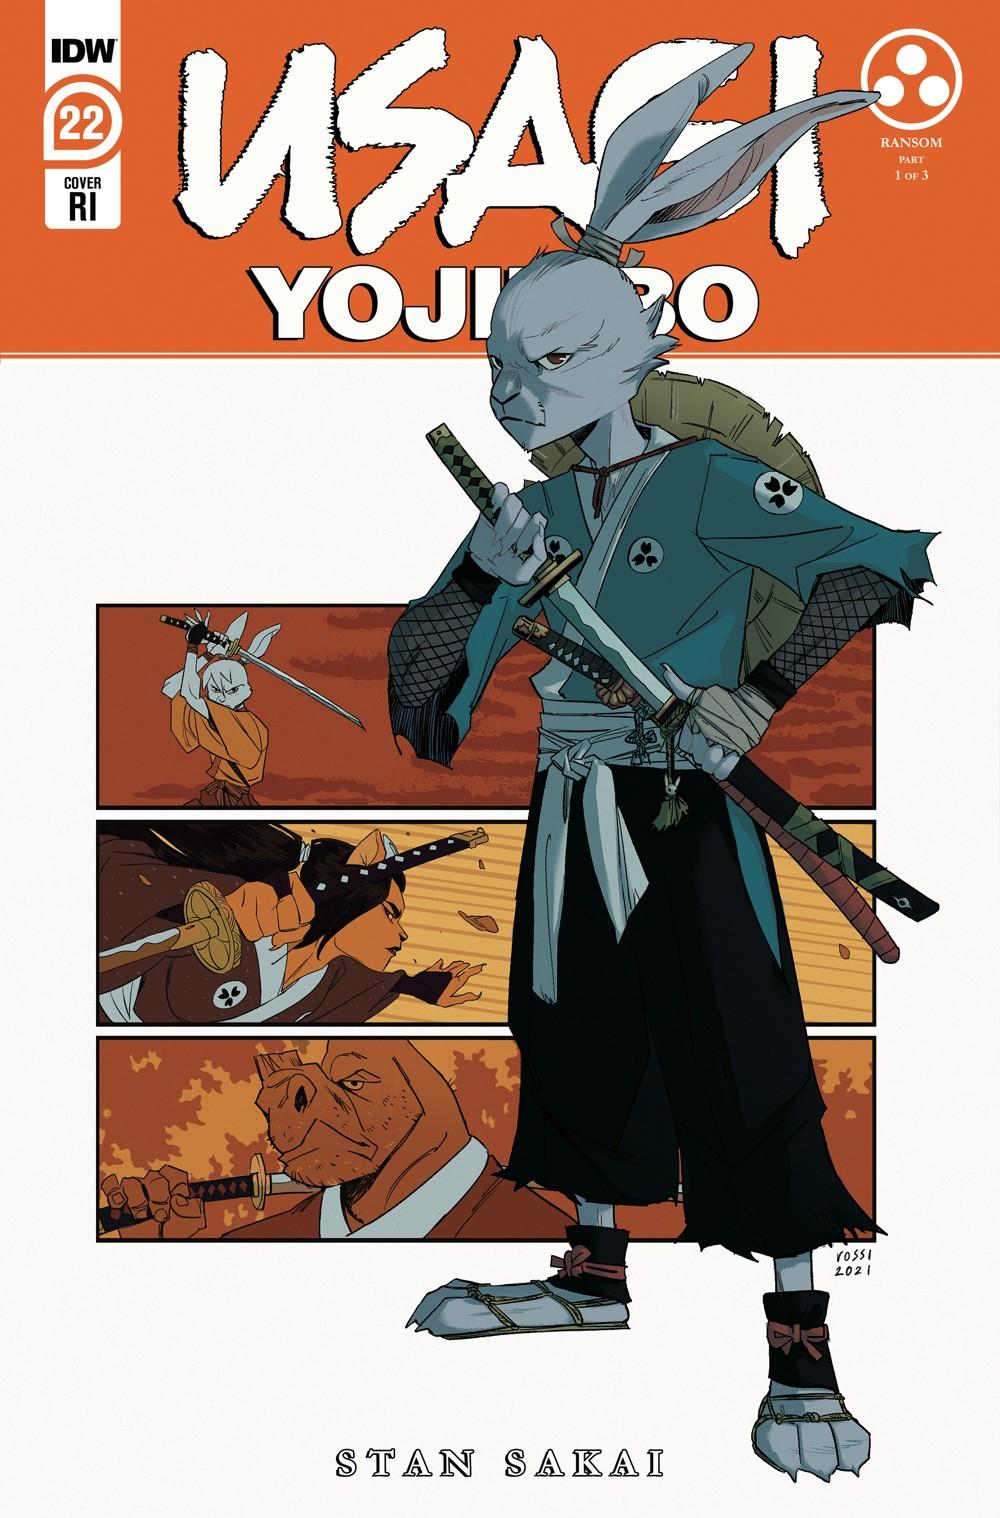 Usagi22_cvrRI ComicList Previews: USAGI YOJIMBO #22